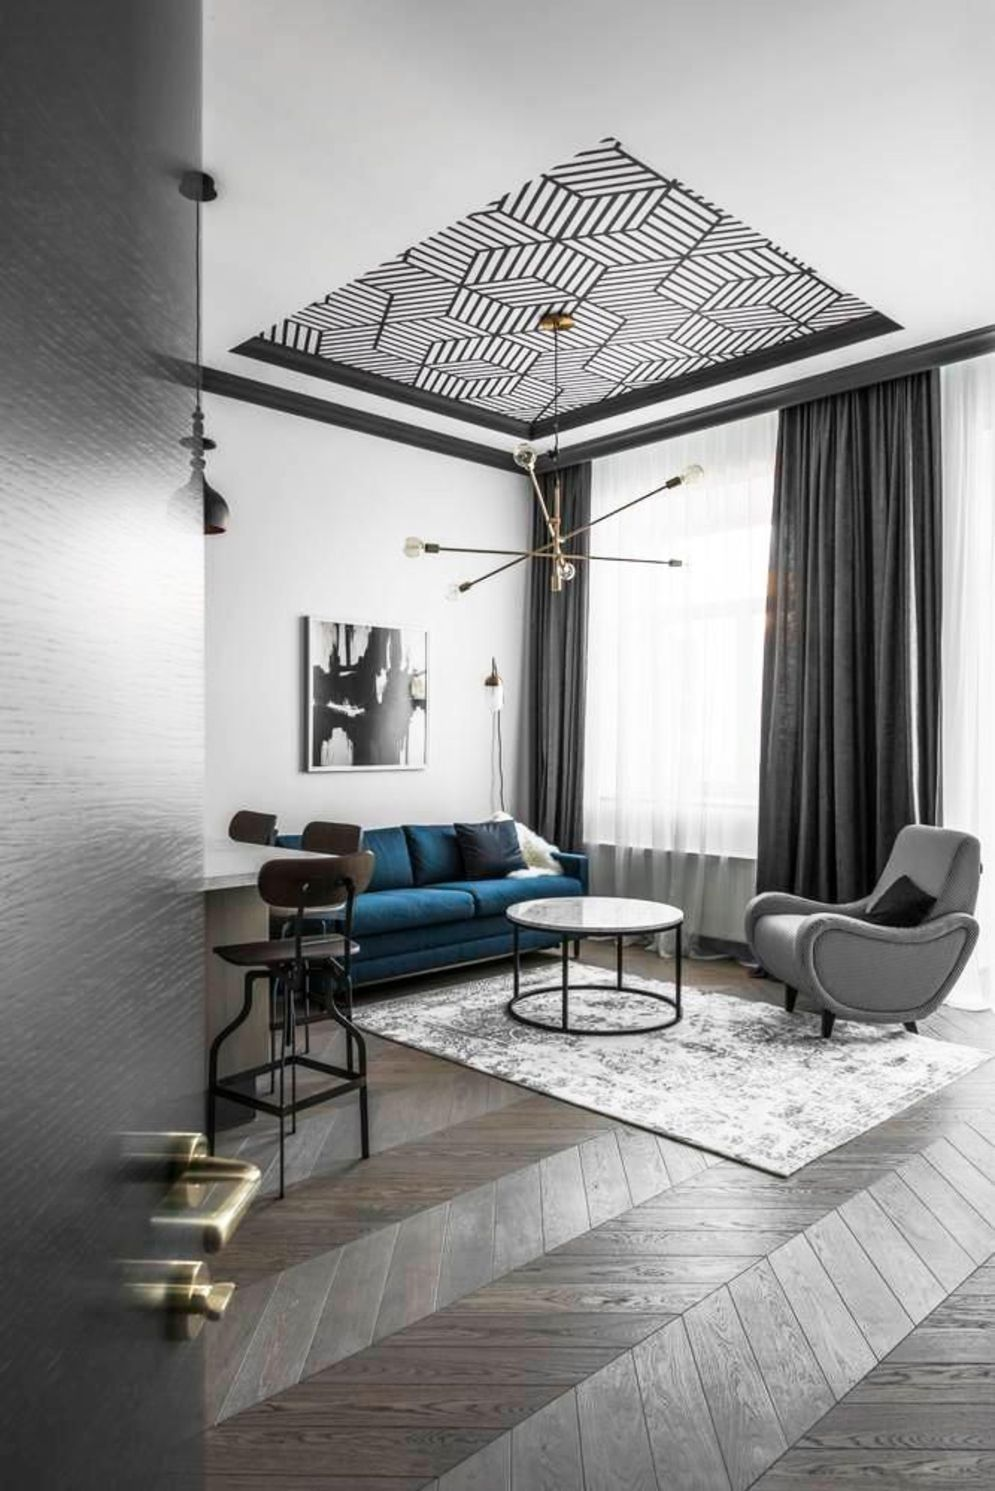 Aesthetic False Ceiling Ideas Gracing Beautiful Decor of ...